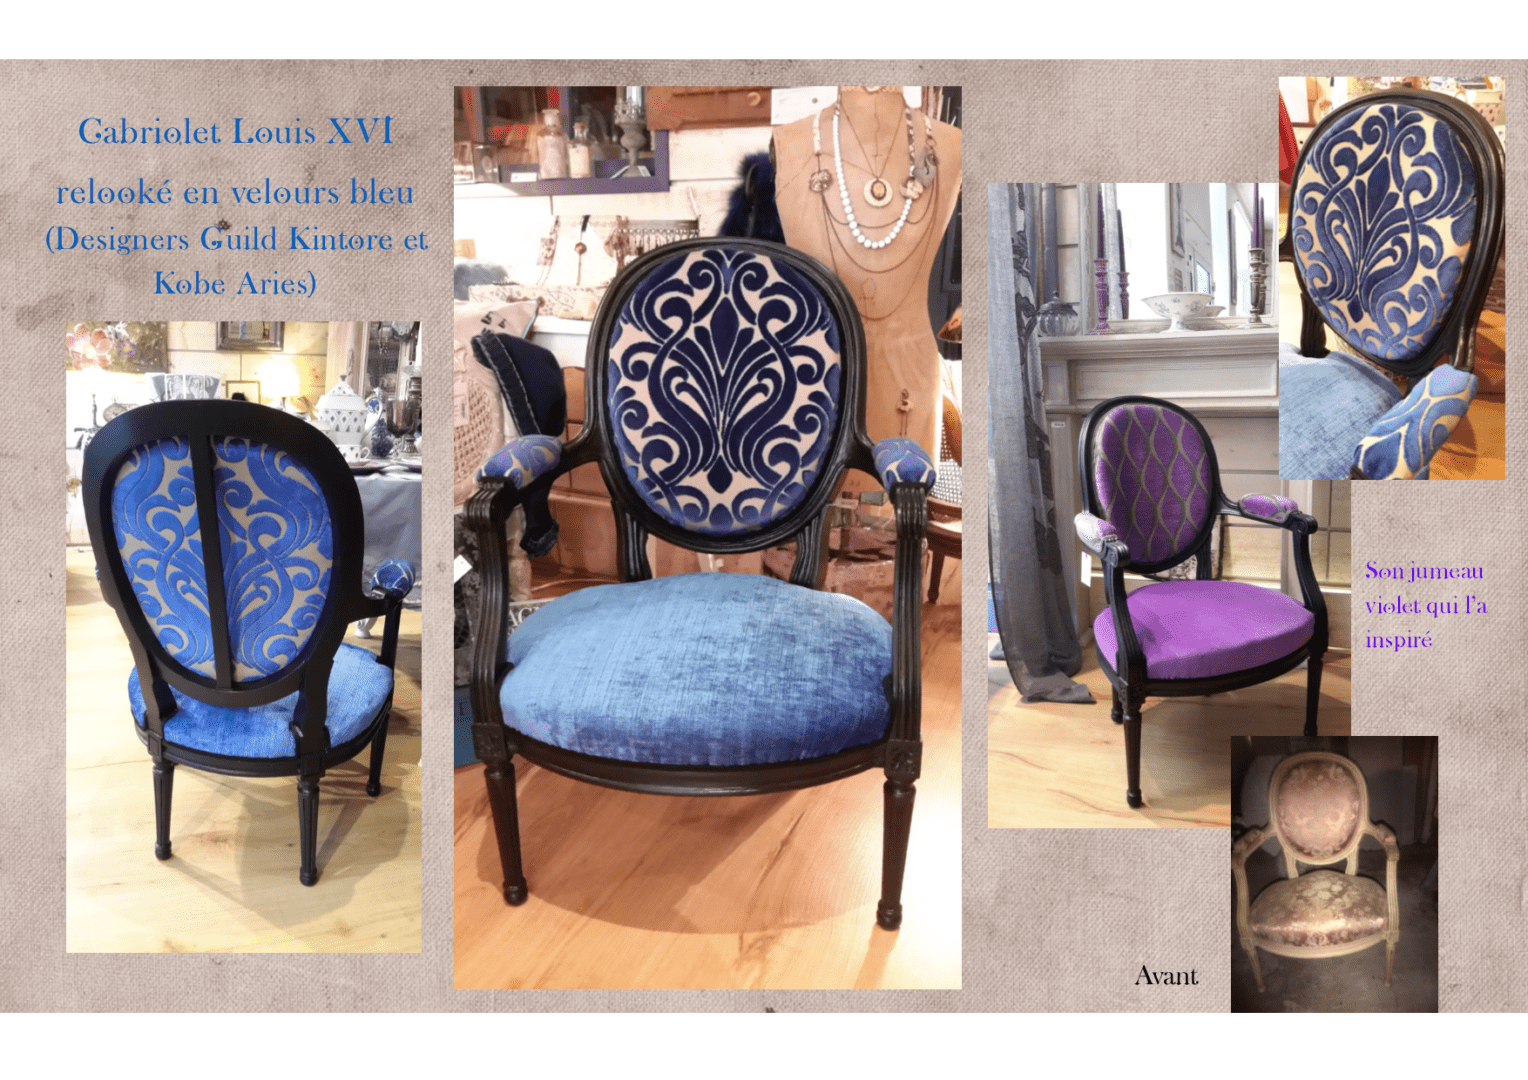 Relooking de meubles l 39 exquise trouvaille for Relooker meubles anciens